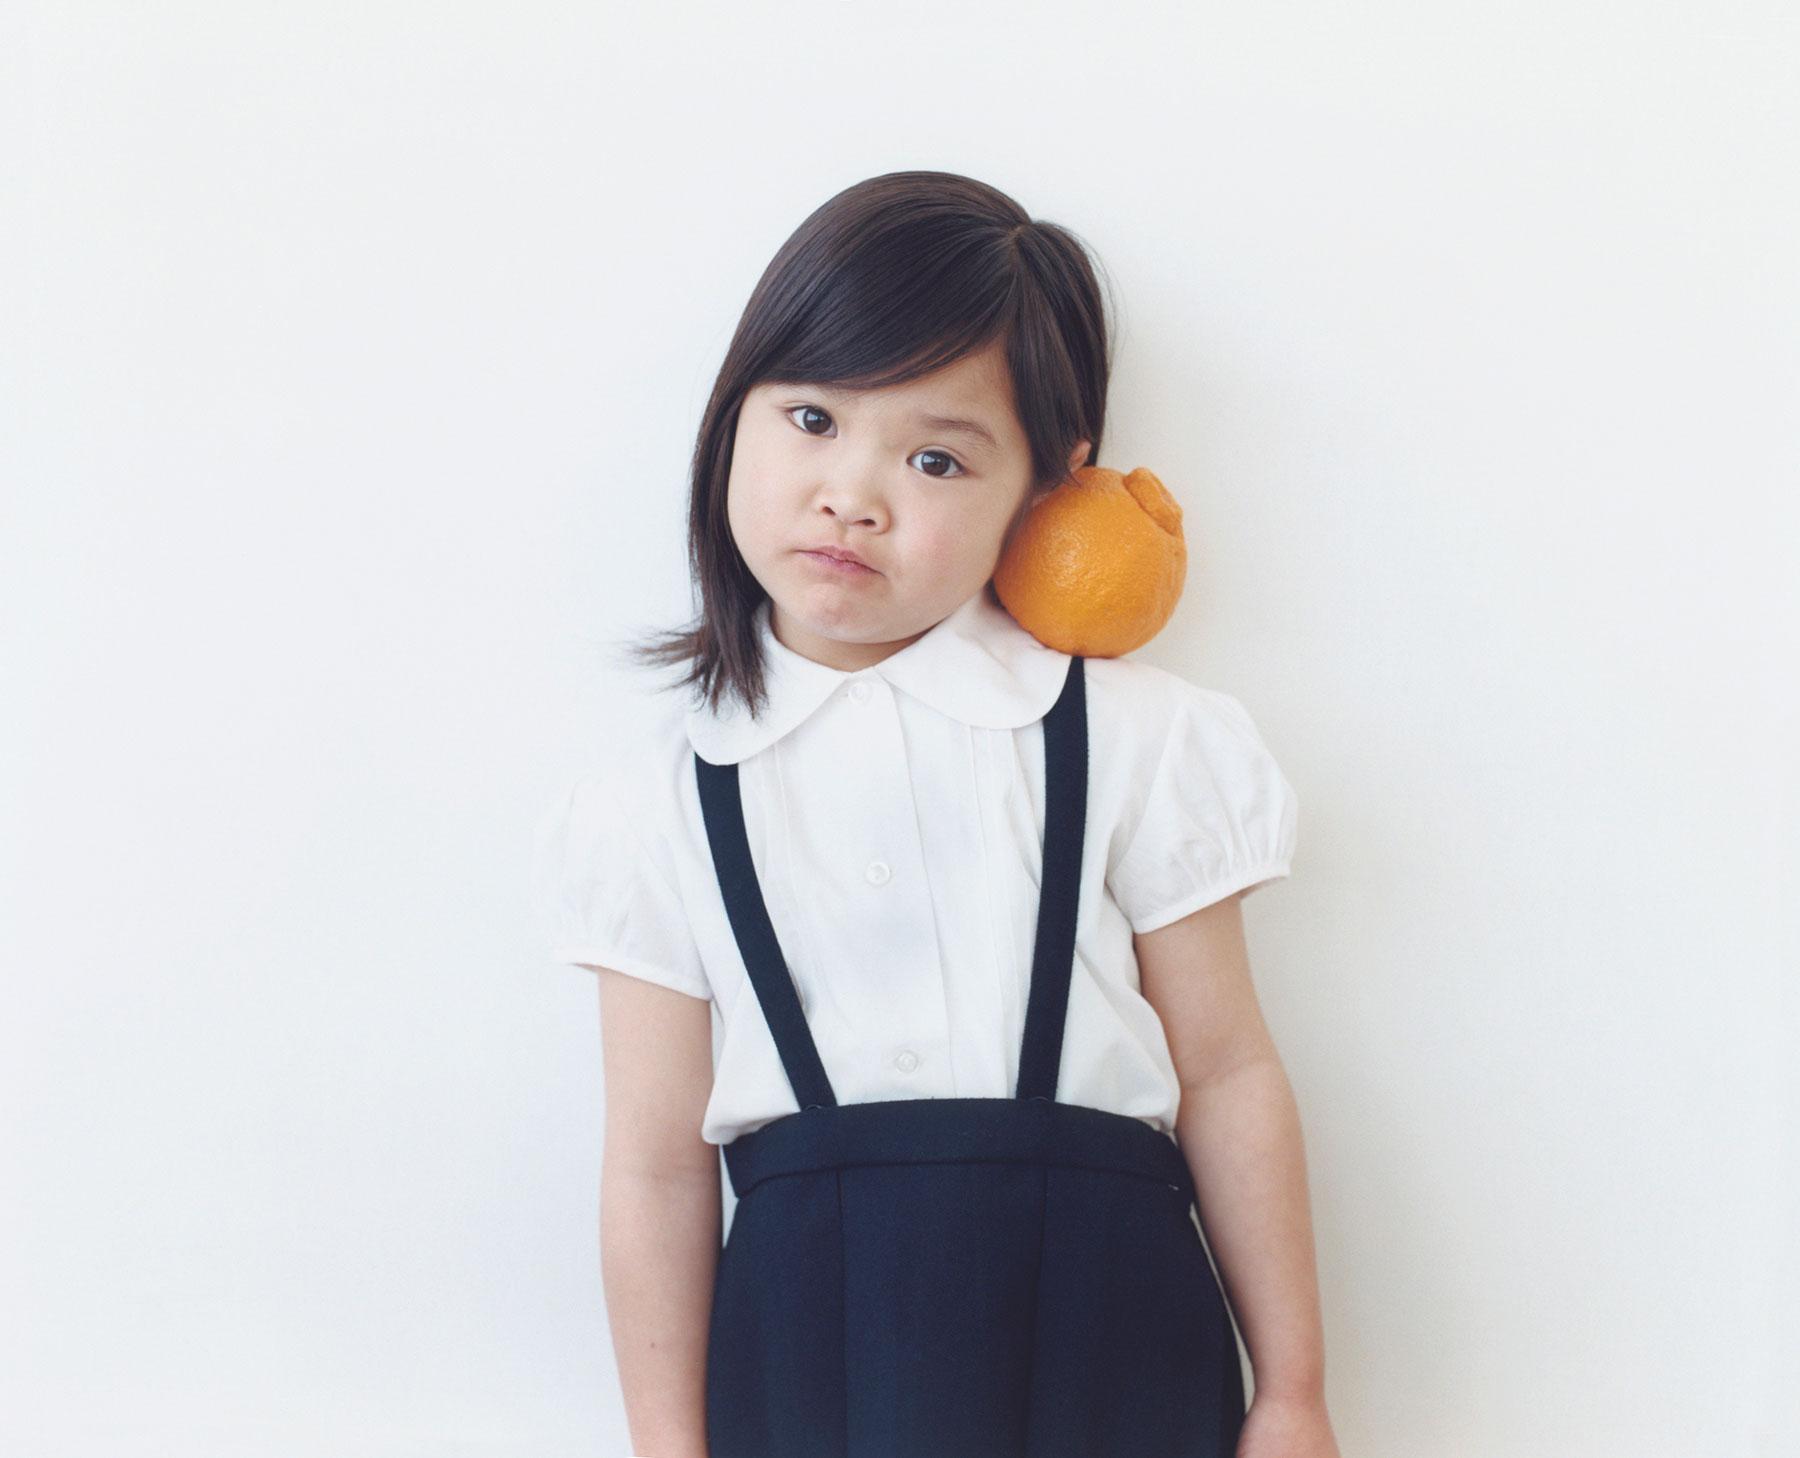 Osamu Yokonami,  1000 Children: Sumo Mandarin No. 46 , 2010-2013  Digital pigment print, 895 x 1105 mm (approx. 34.25 x 43.5 in), edition of 5; 146 x 168 mm (approx. 5.75 x 6.6 in), edition of 10   Inquire